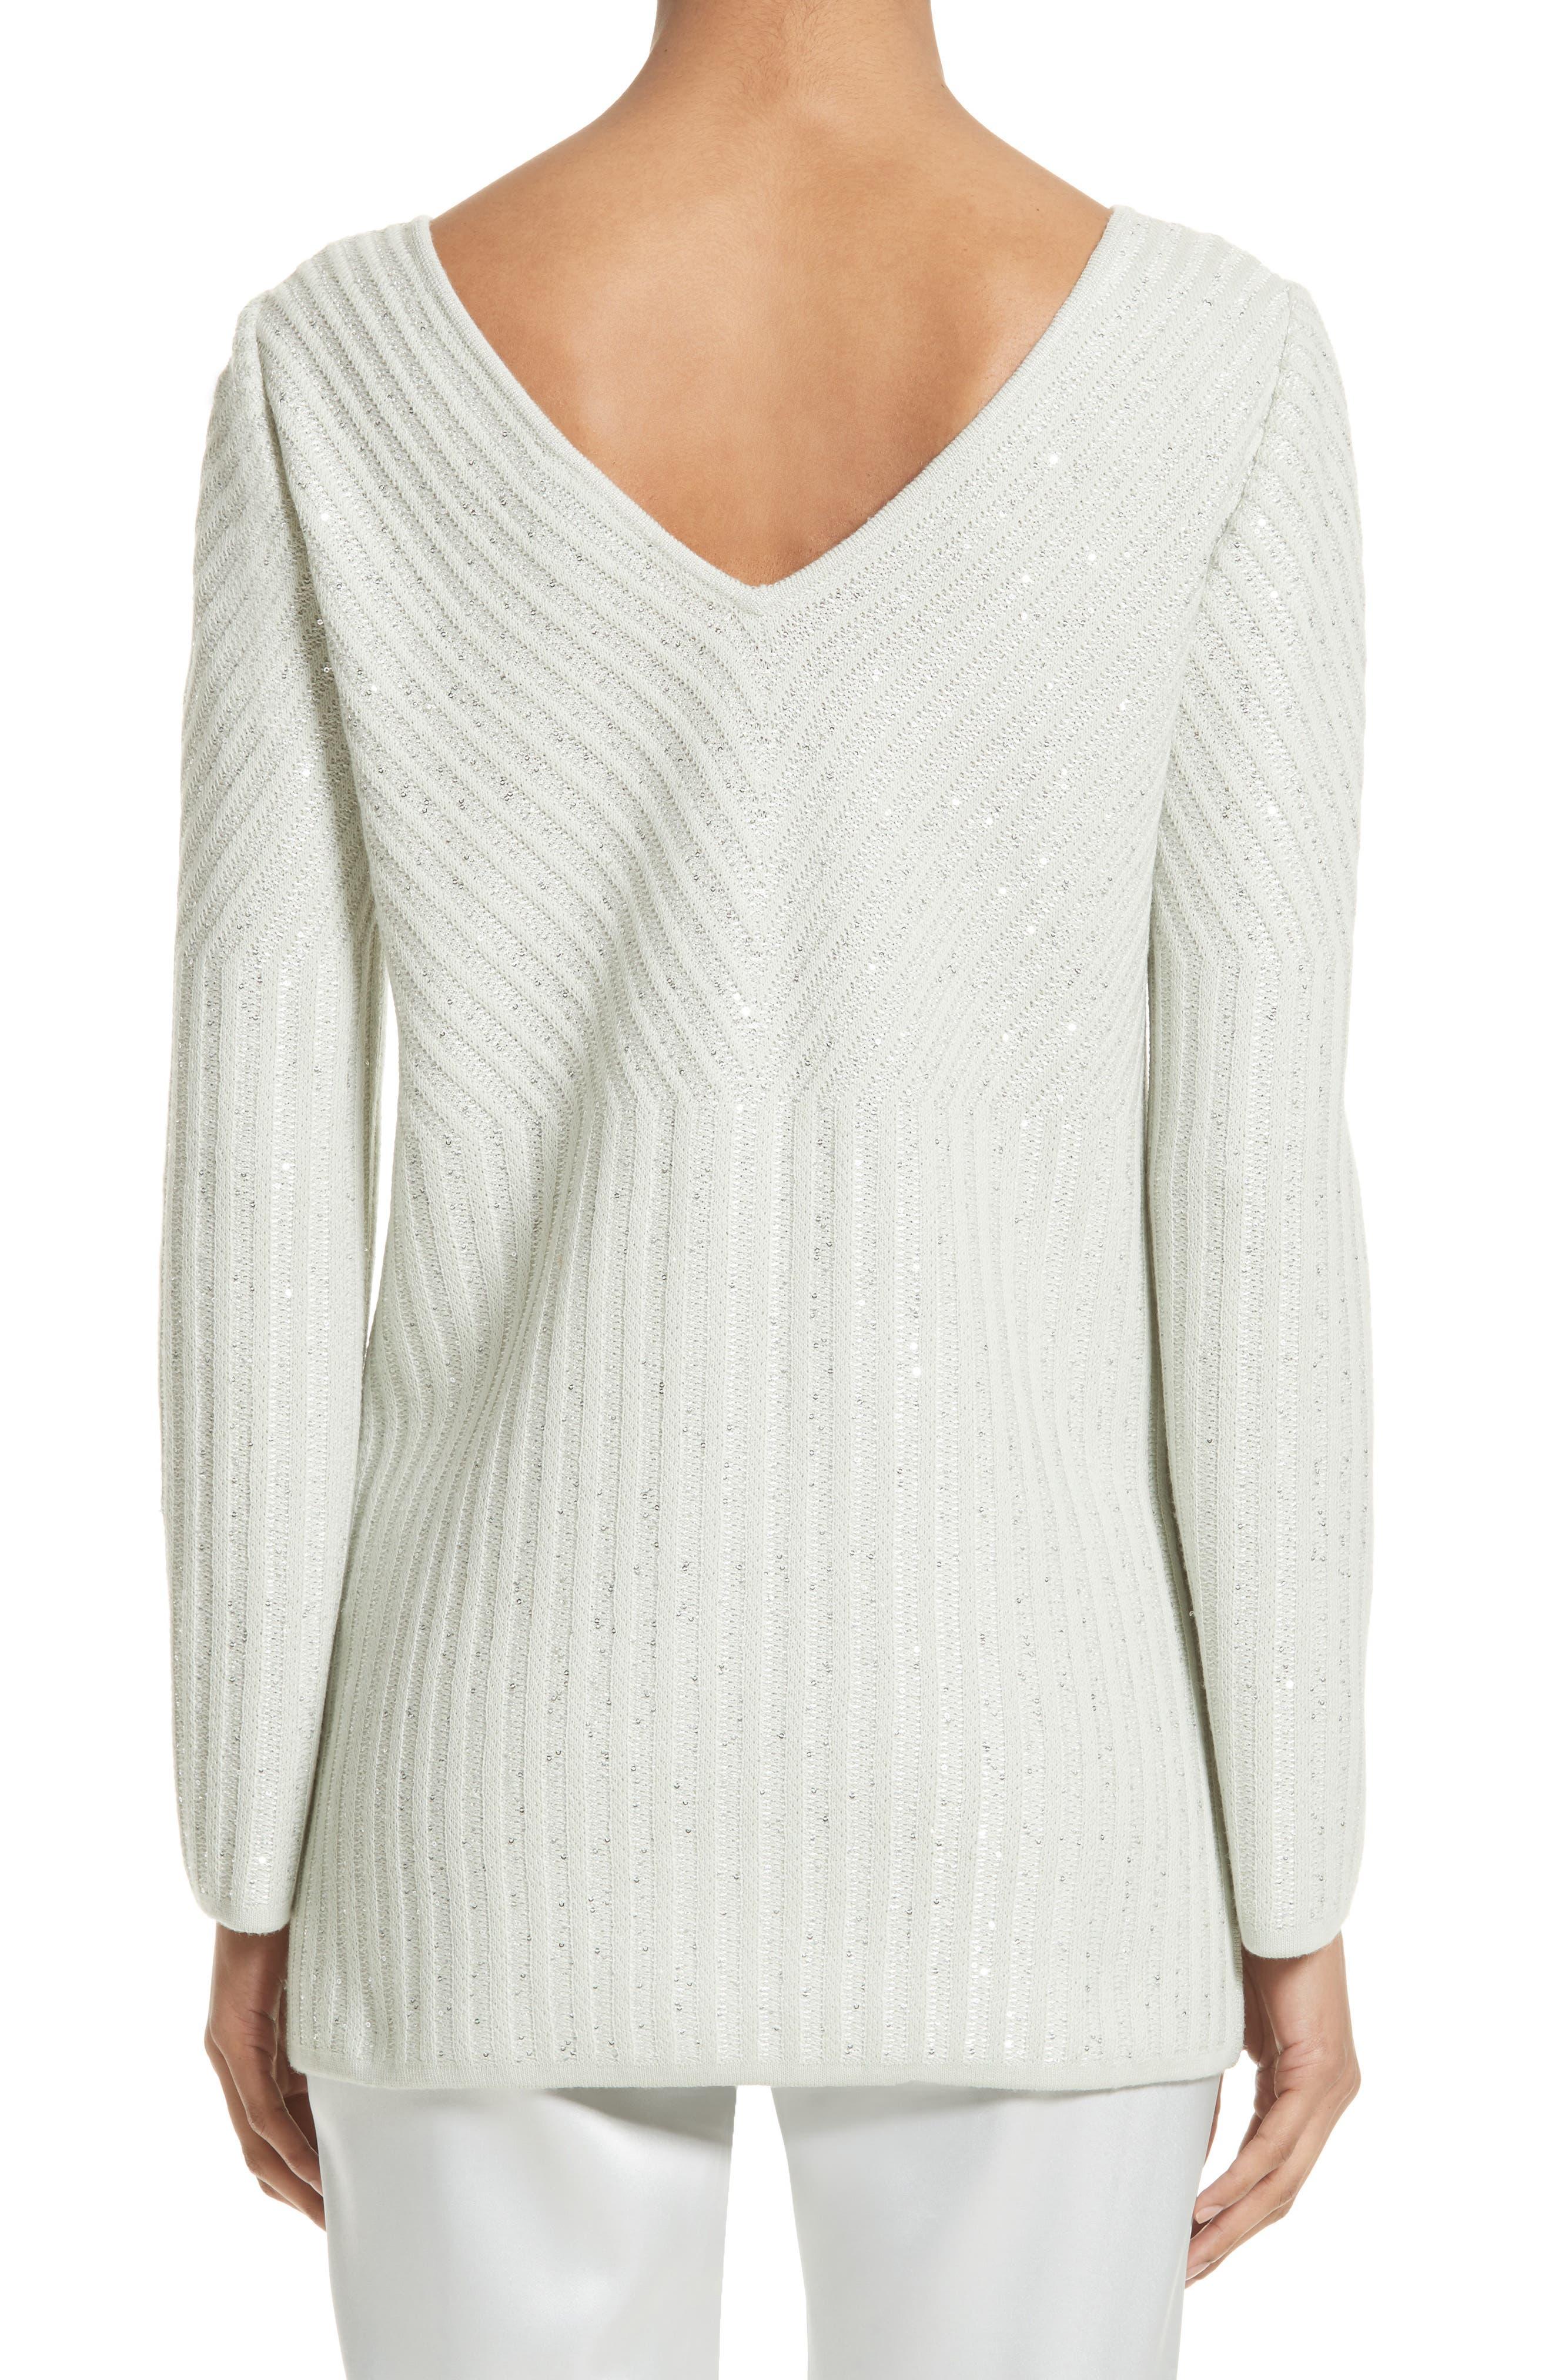 Alternate Image 2  - St. John Collection Sparkle Engineered Rib Sweater